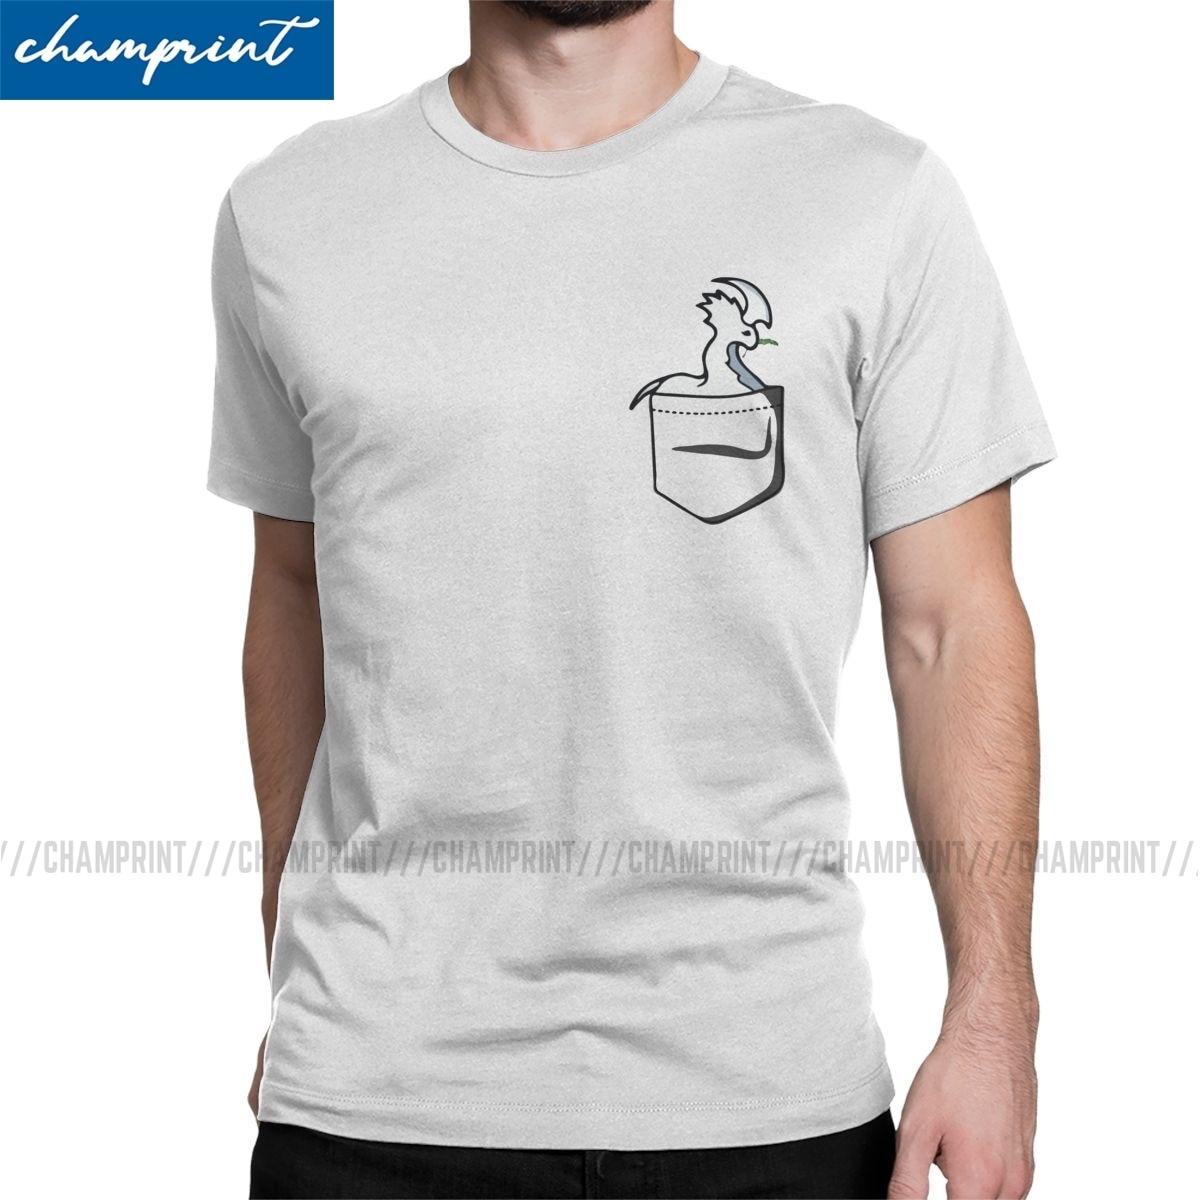 Camisetas de hombre de bolsillo Thrumbo Chewing Pine Tree Branch divertidas Meme camisetas increíbles de manga corta Rimworld Gaming camisetas ropa